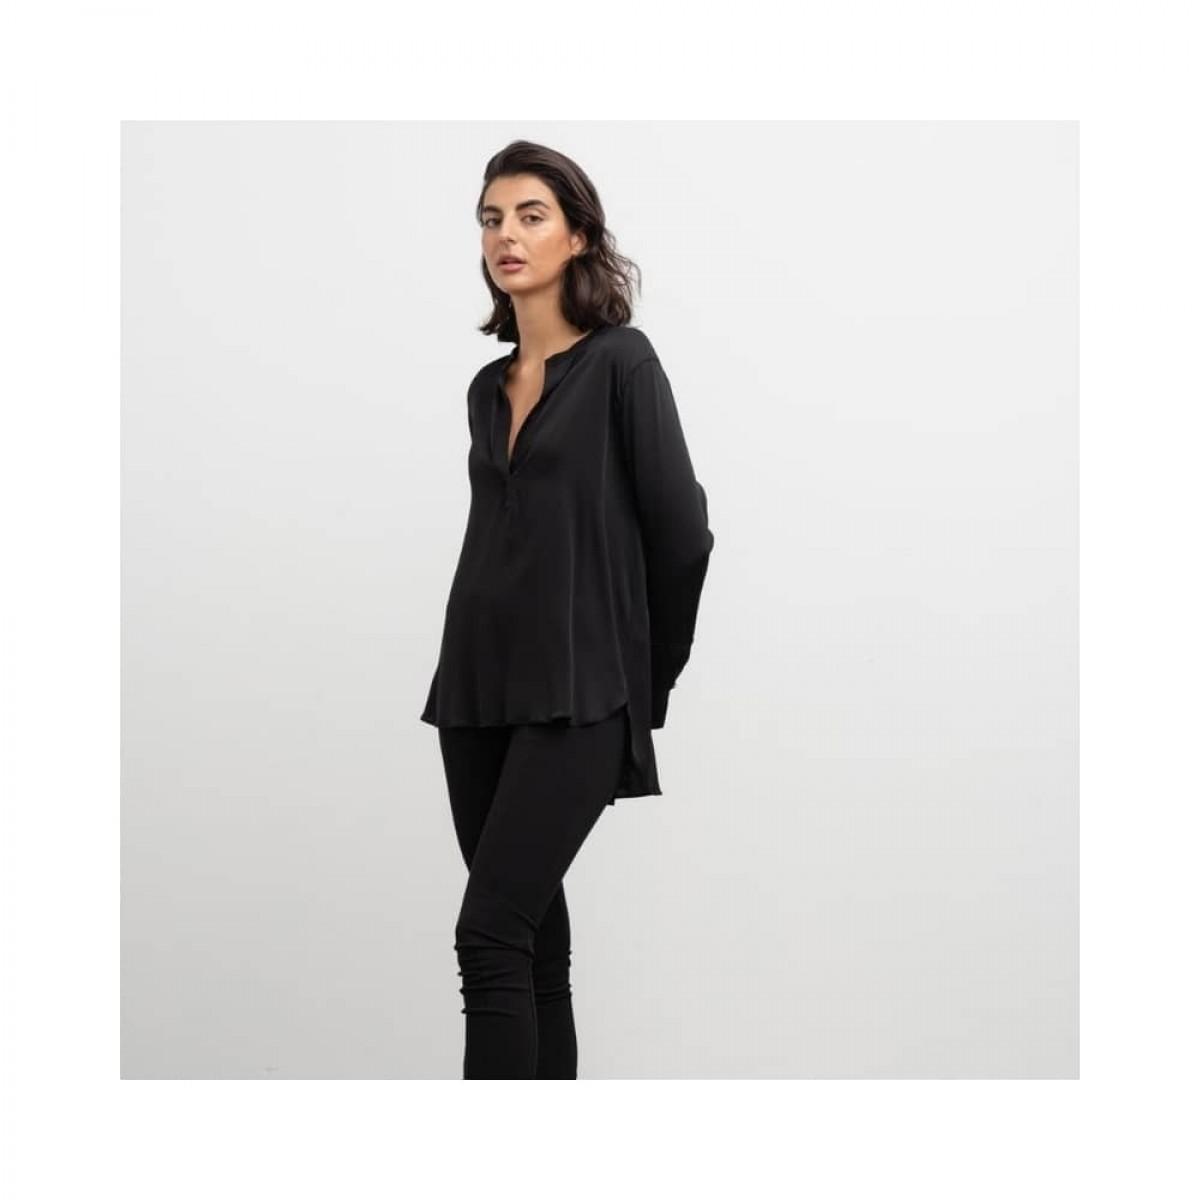 coco blouse - black - model front